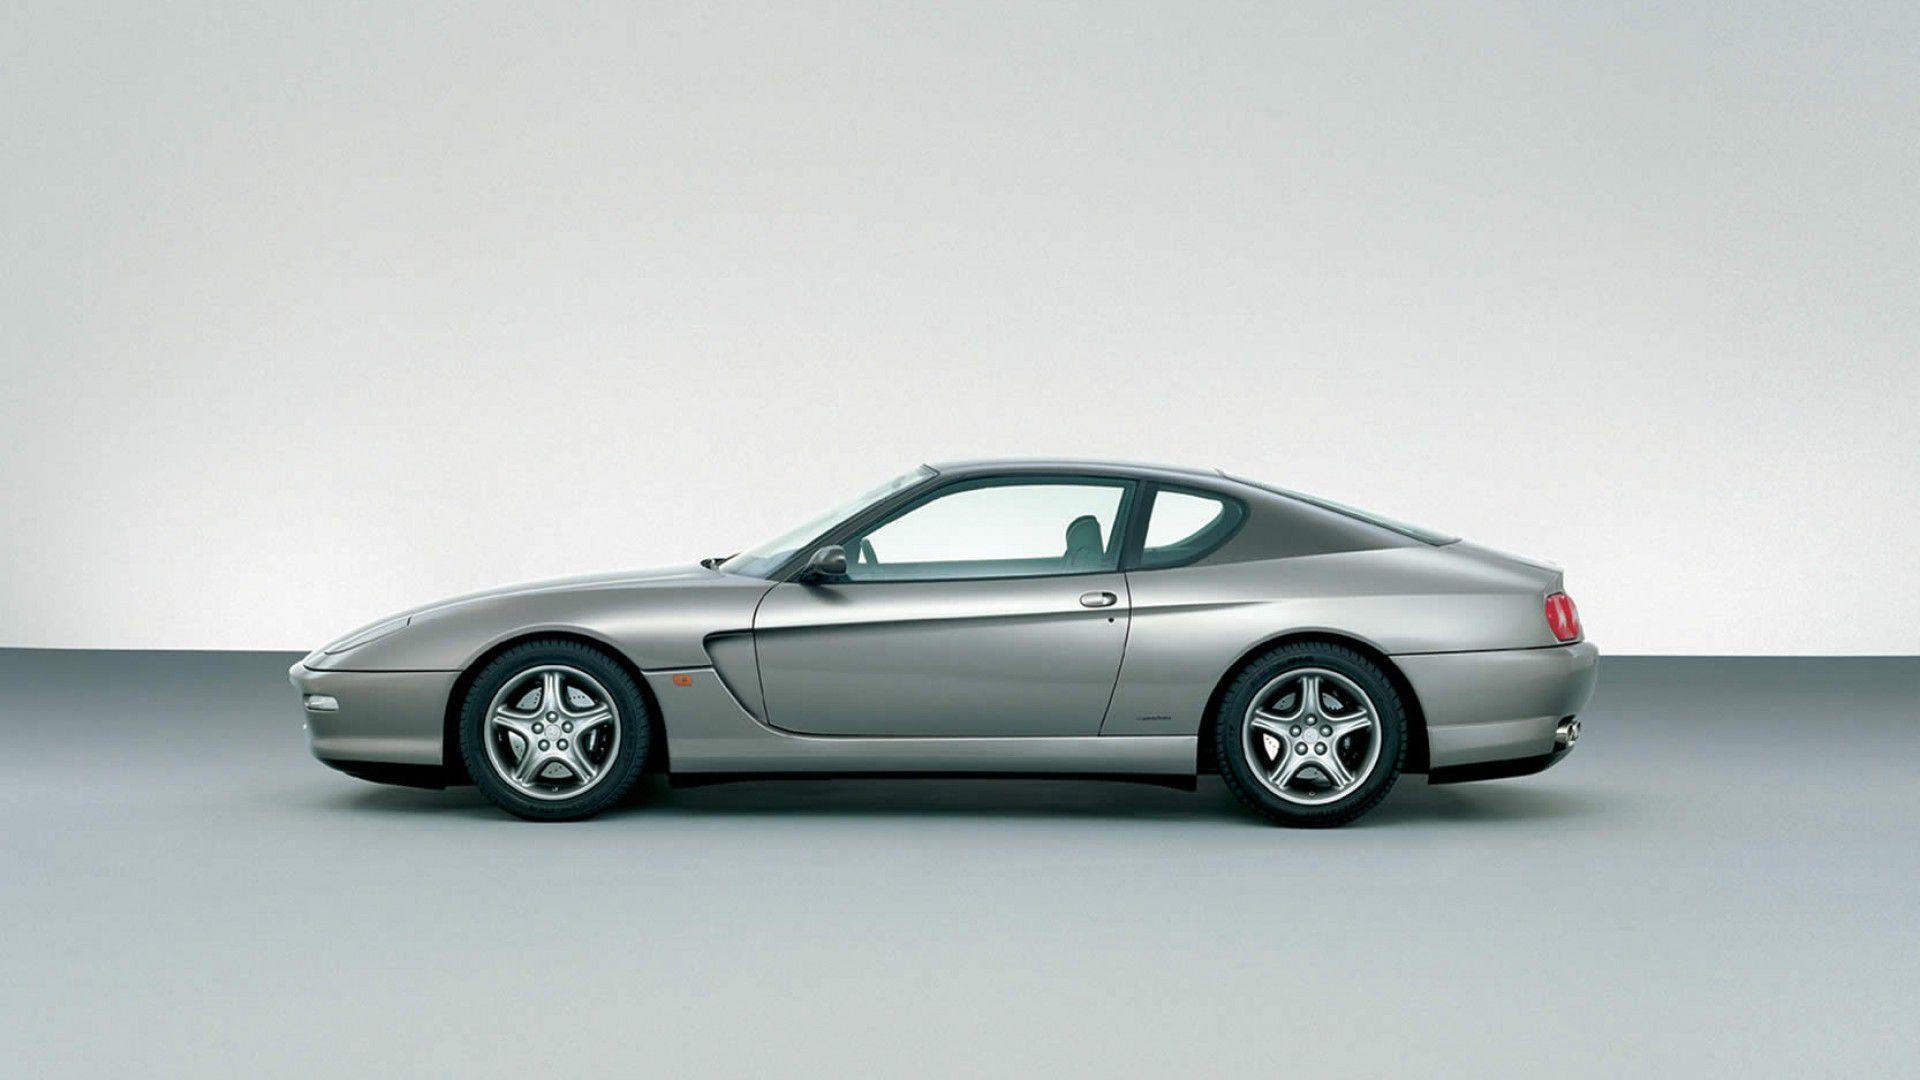 Ferrari 456 M GT & M GTA Coupe